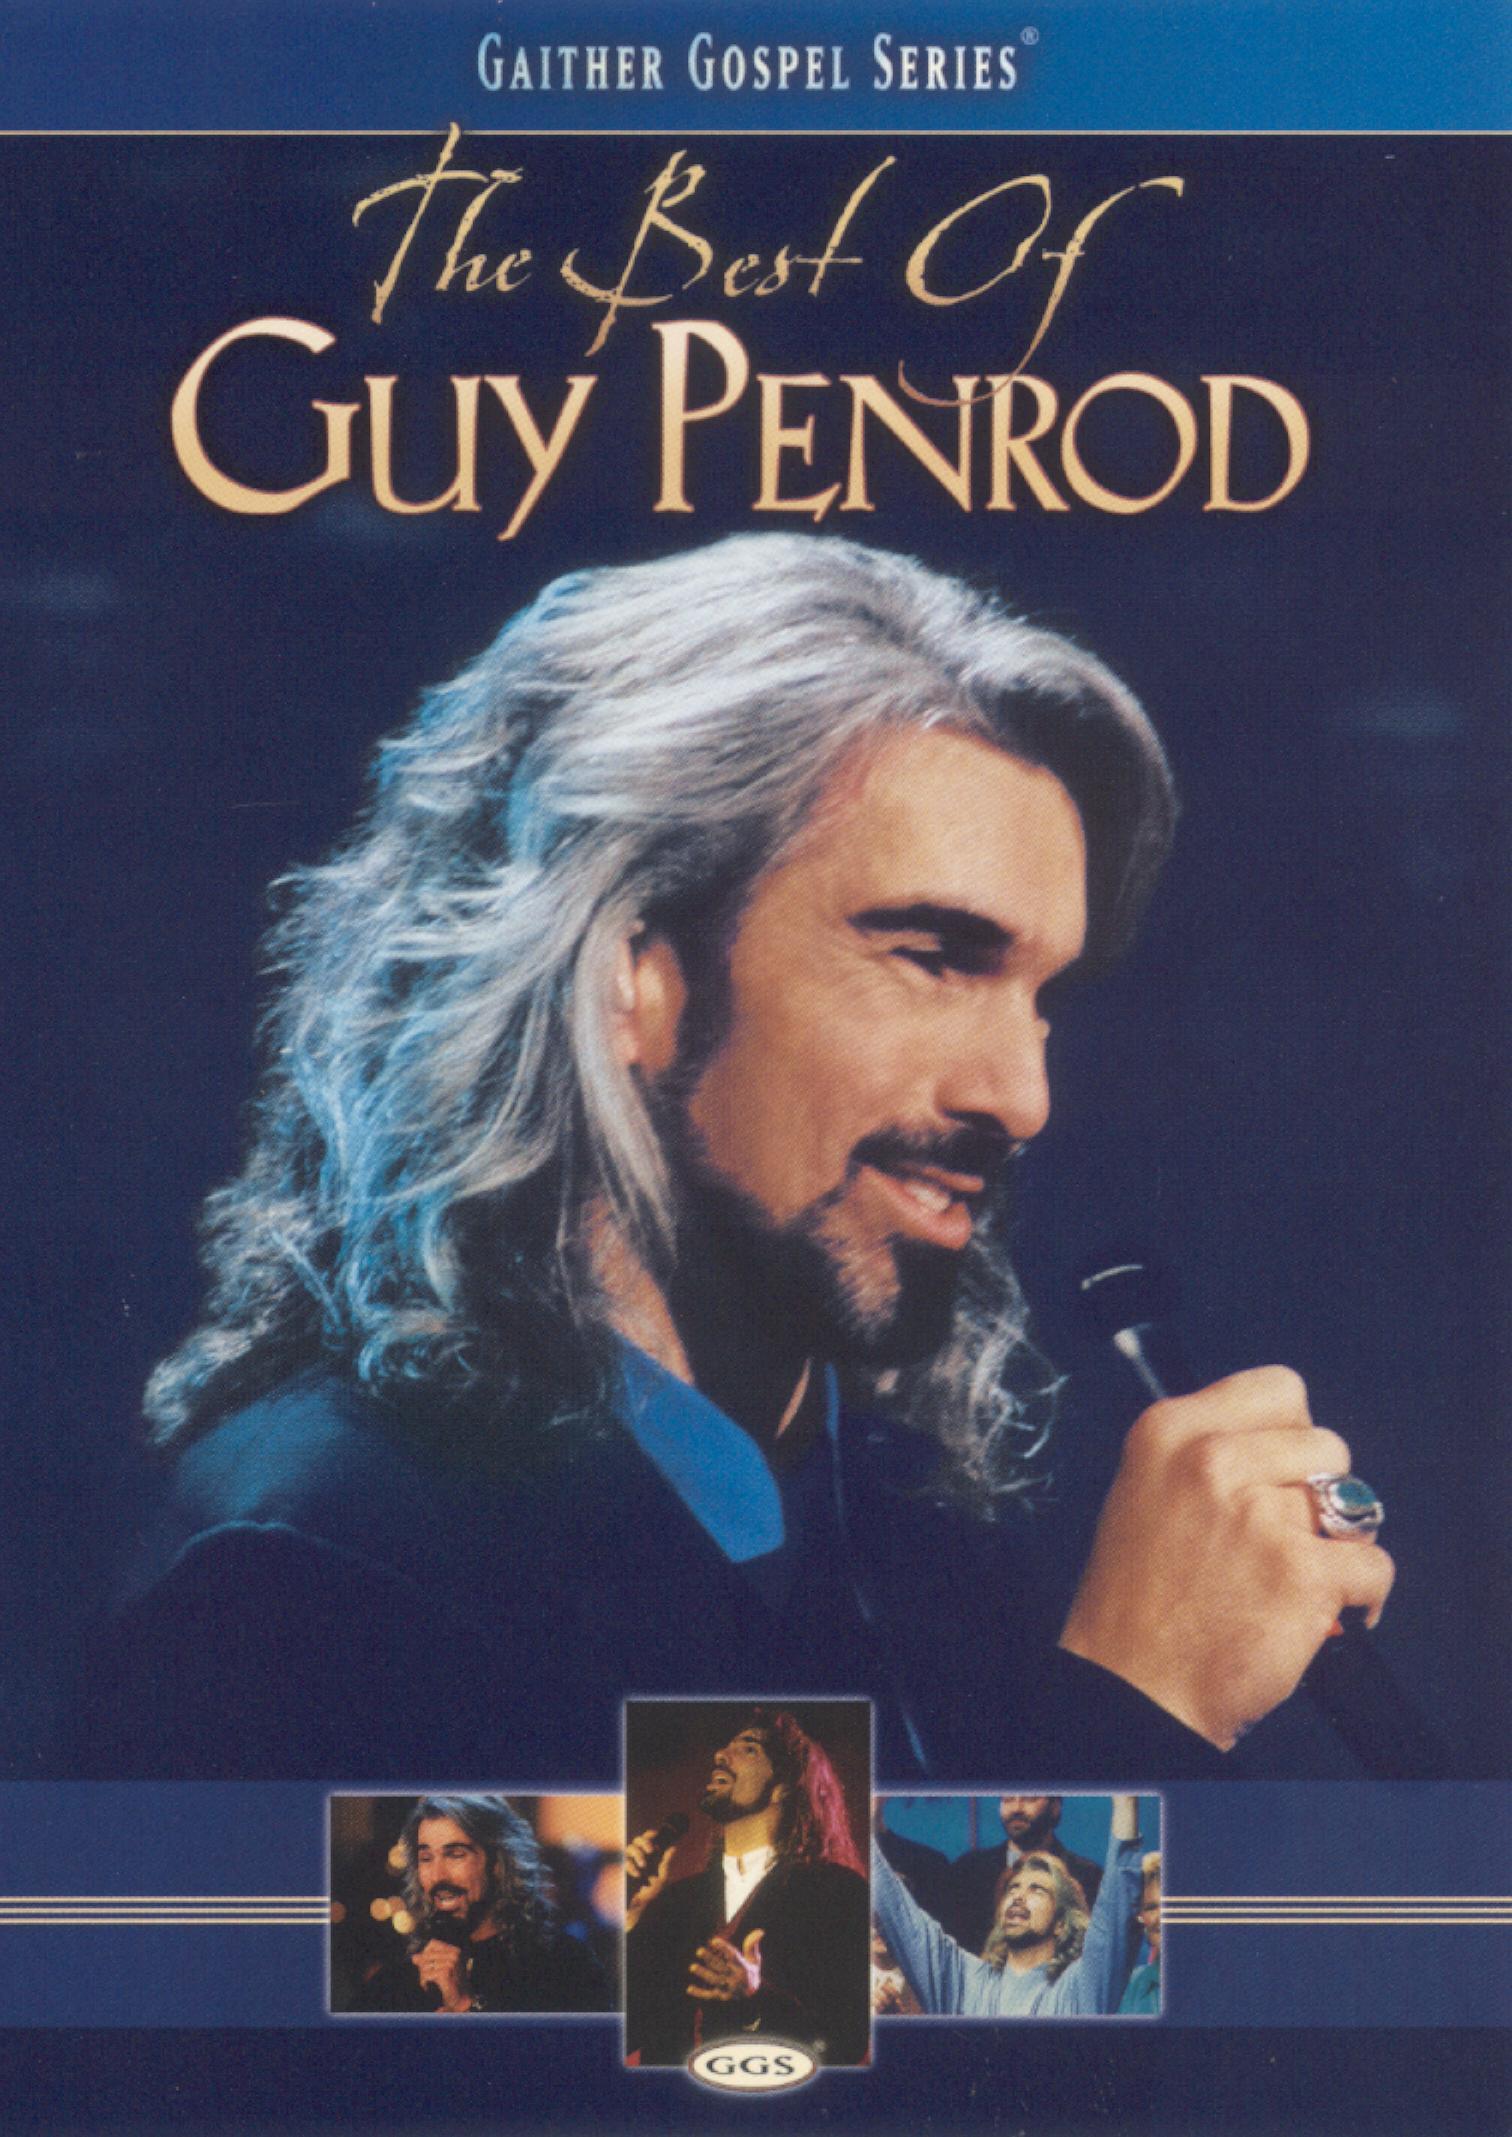 Guy Penrod: The Best of Guy Penrod